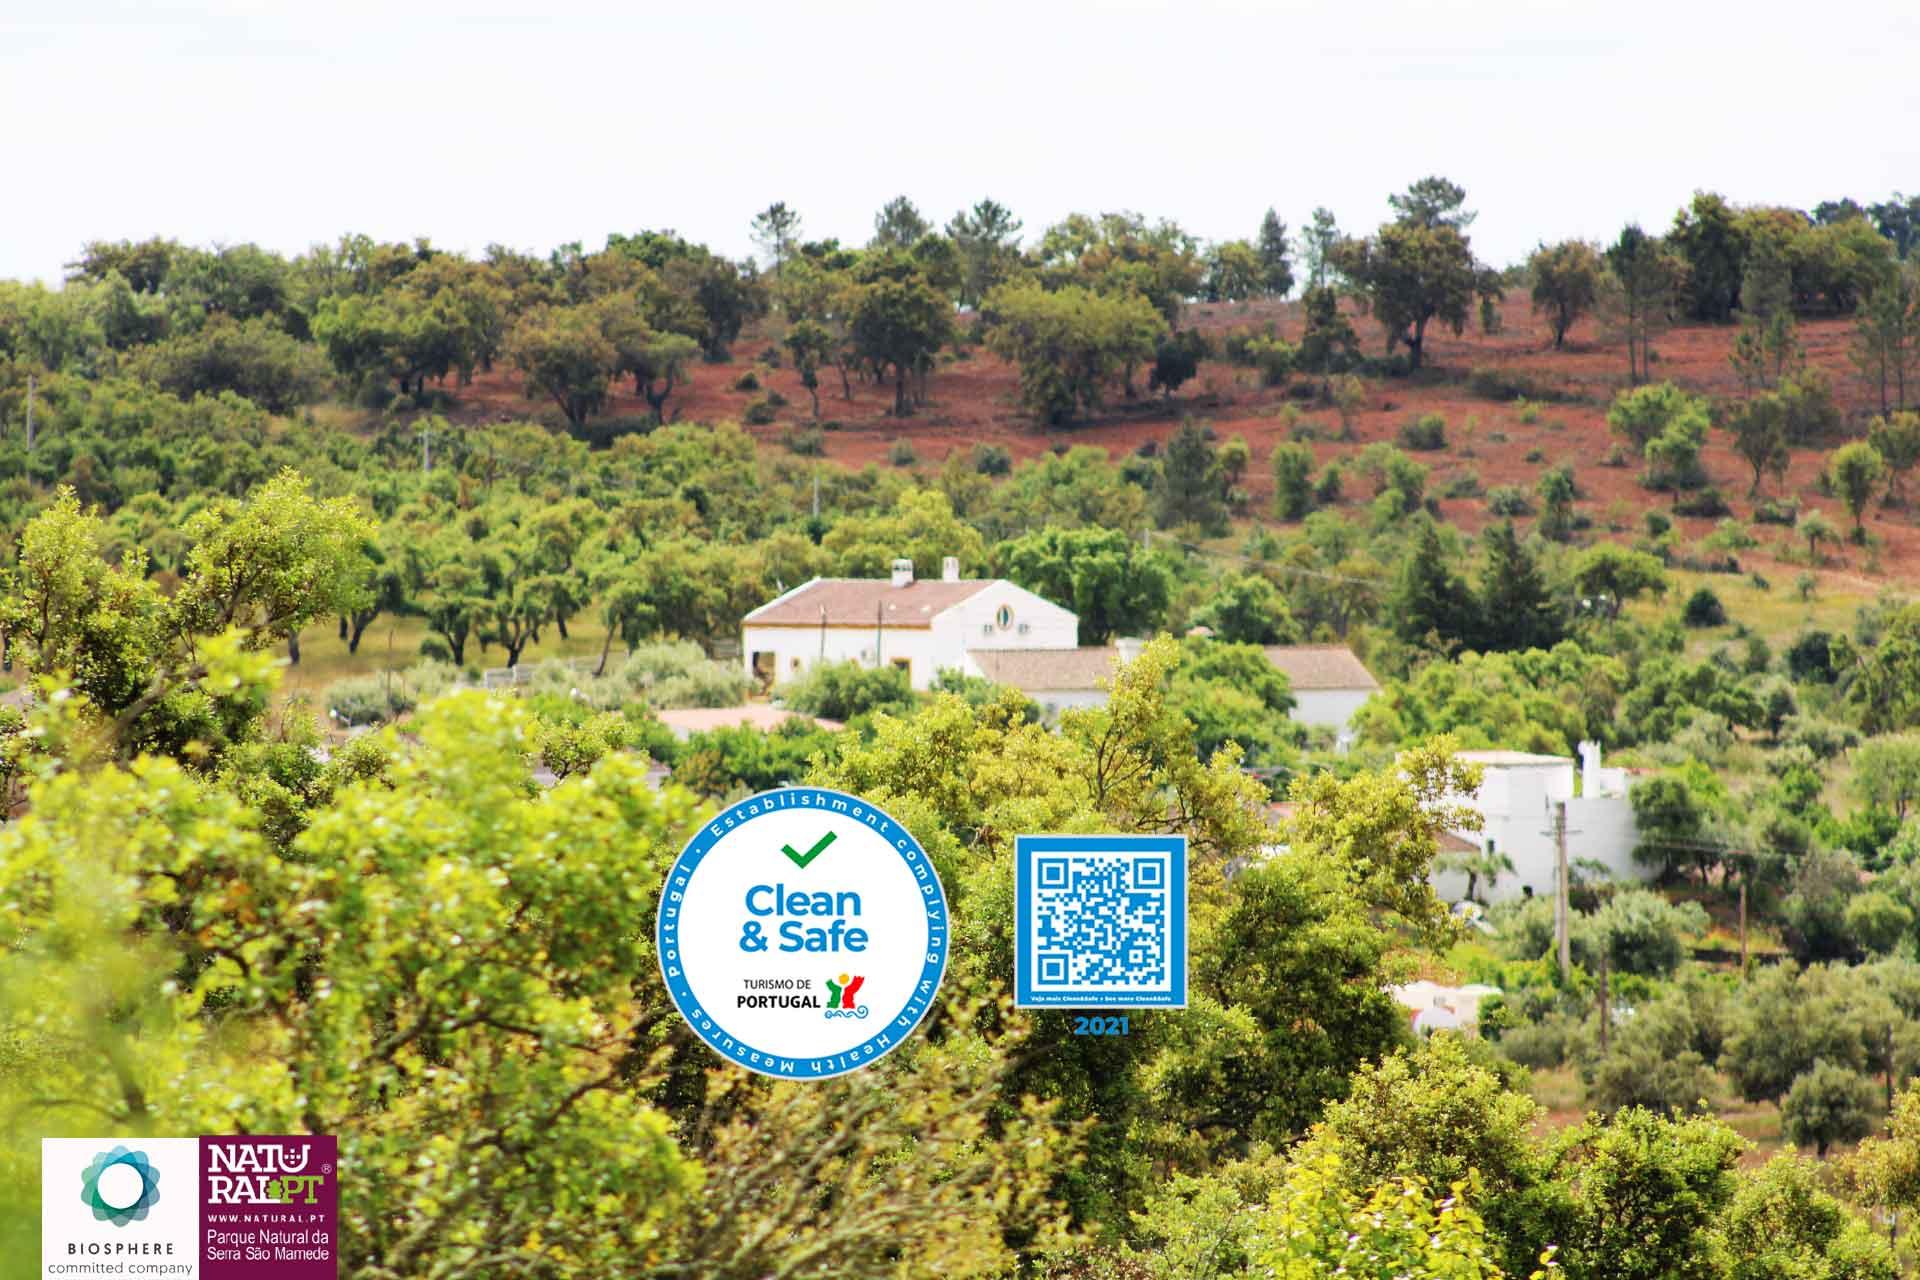 Casa do Marco - Turismo Clean & safe 2021Raiano